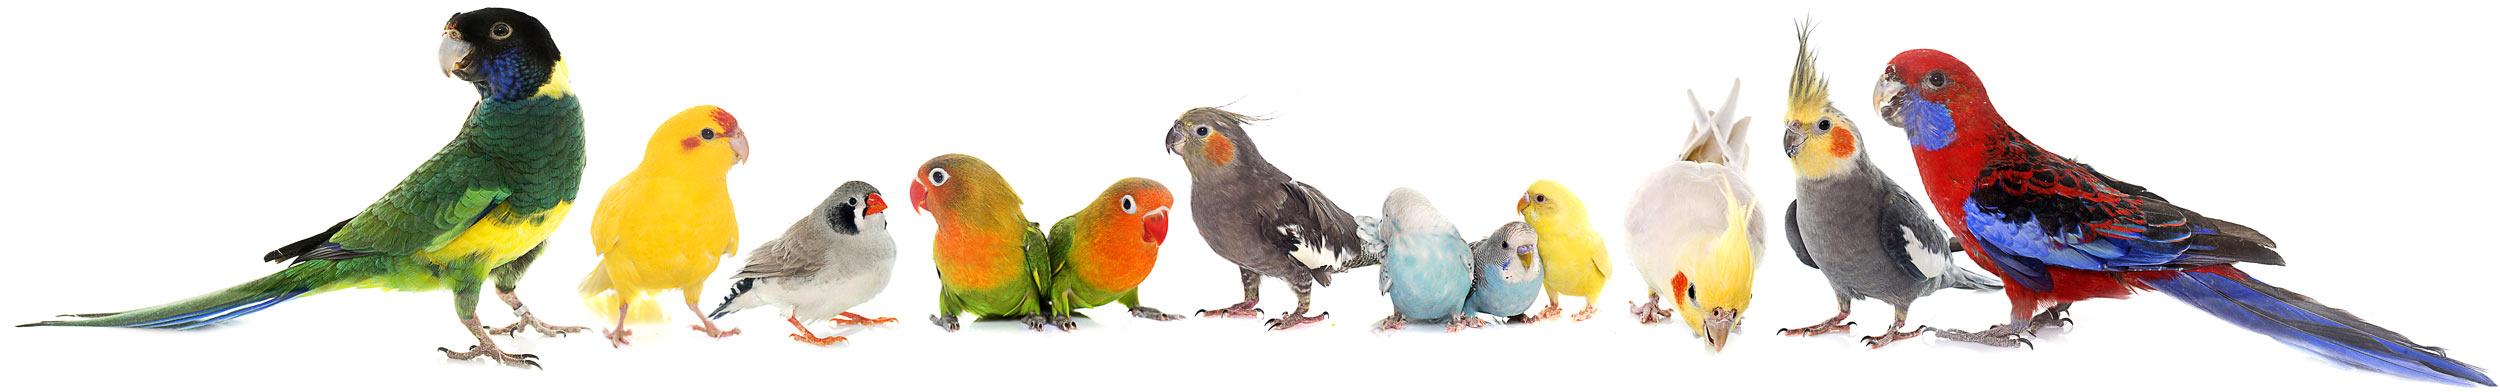 homebg-birdgenetics